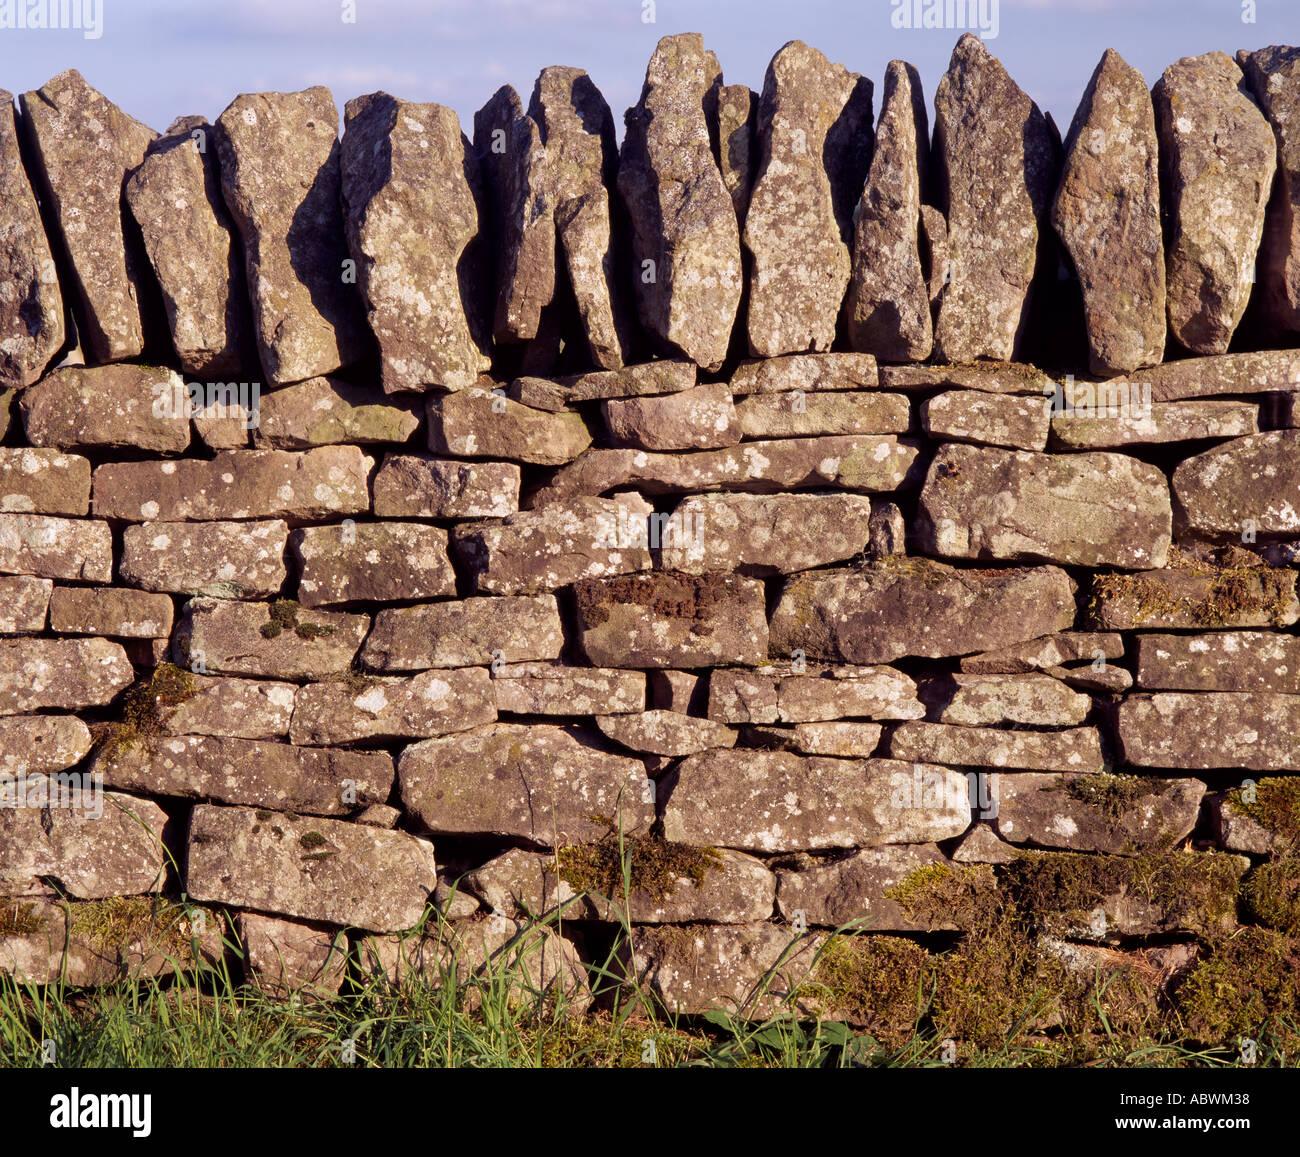 Drystone wall, called a dyke or drystane dyke in Scotland - Stock Image